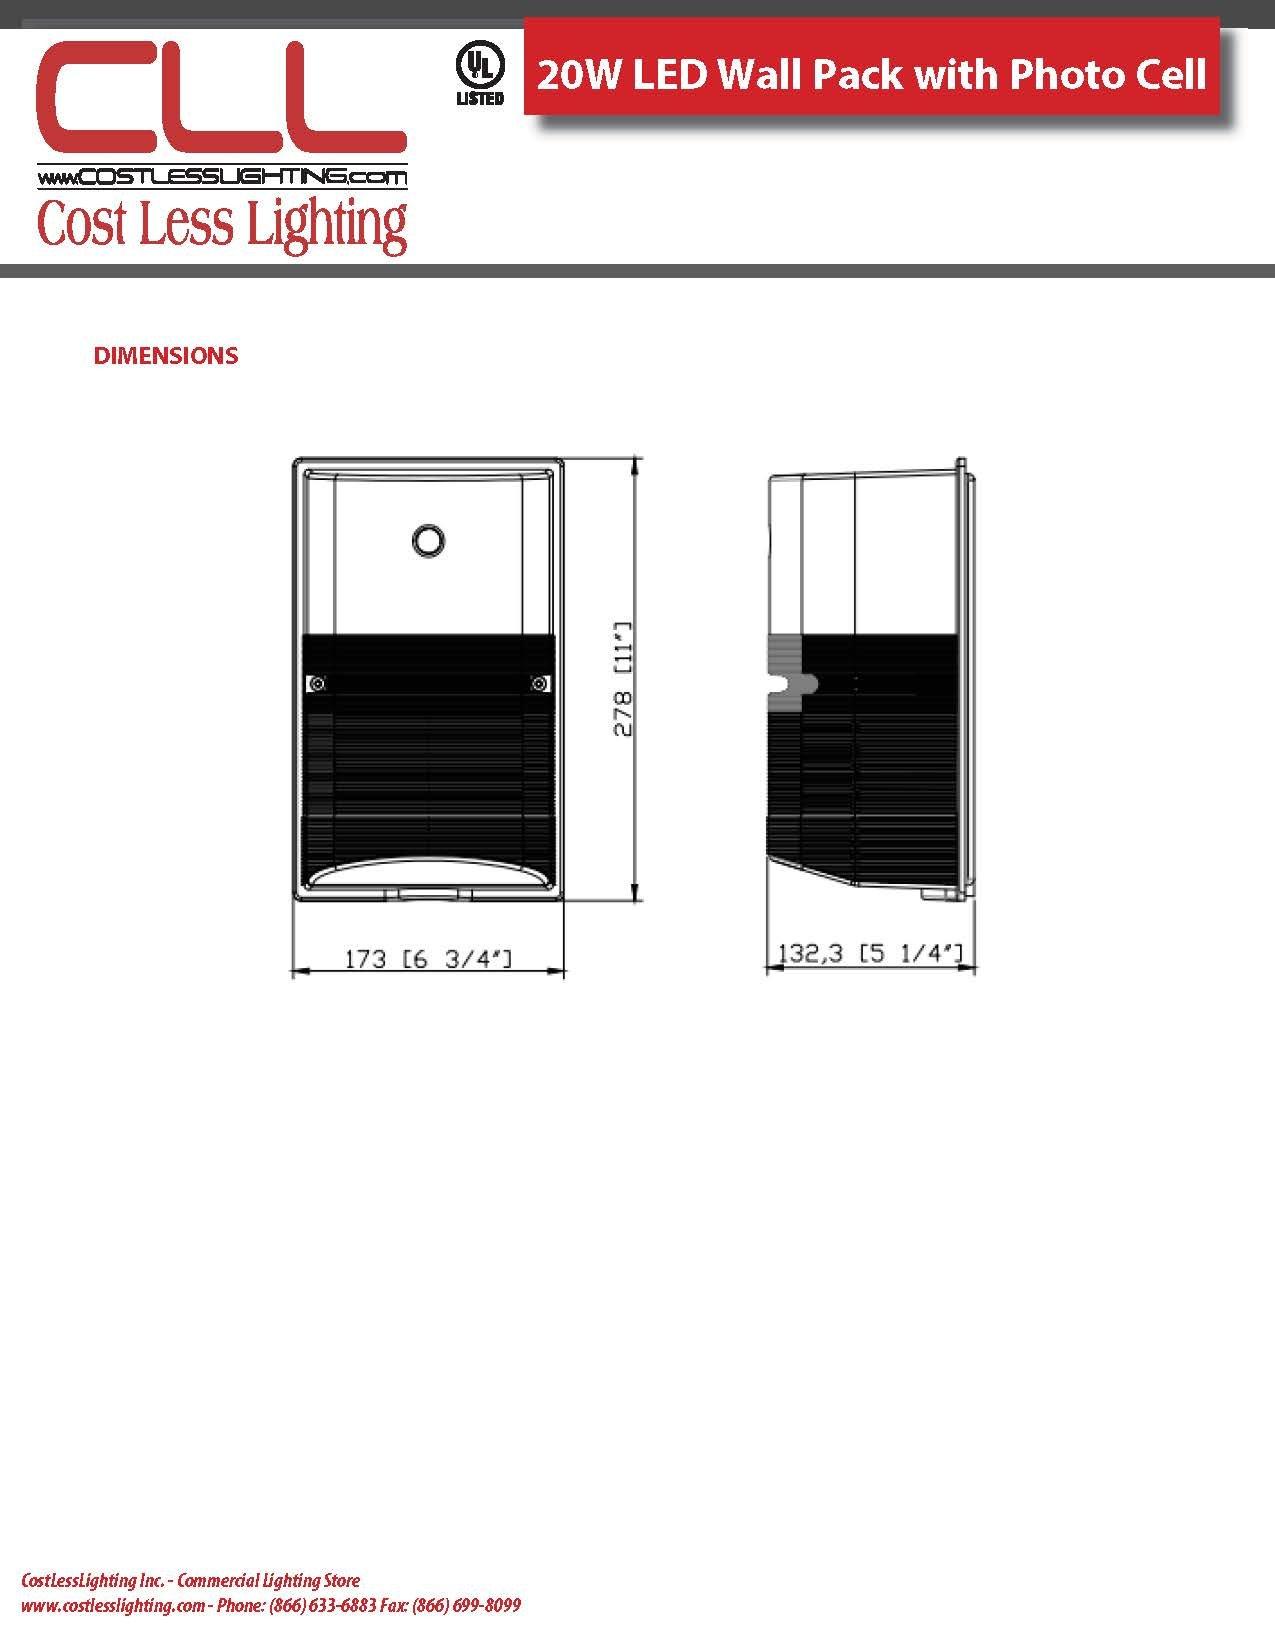 Cost Less Lighting 20 Watt LED Wall Pack Light with Photo Cell Night Eye- 1500 Lumens - 4000K - 120V - UL Listed